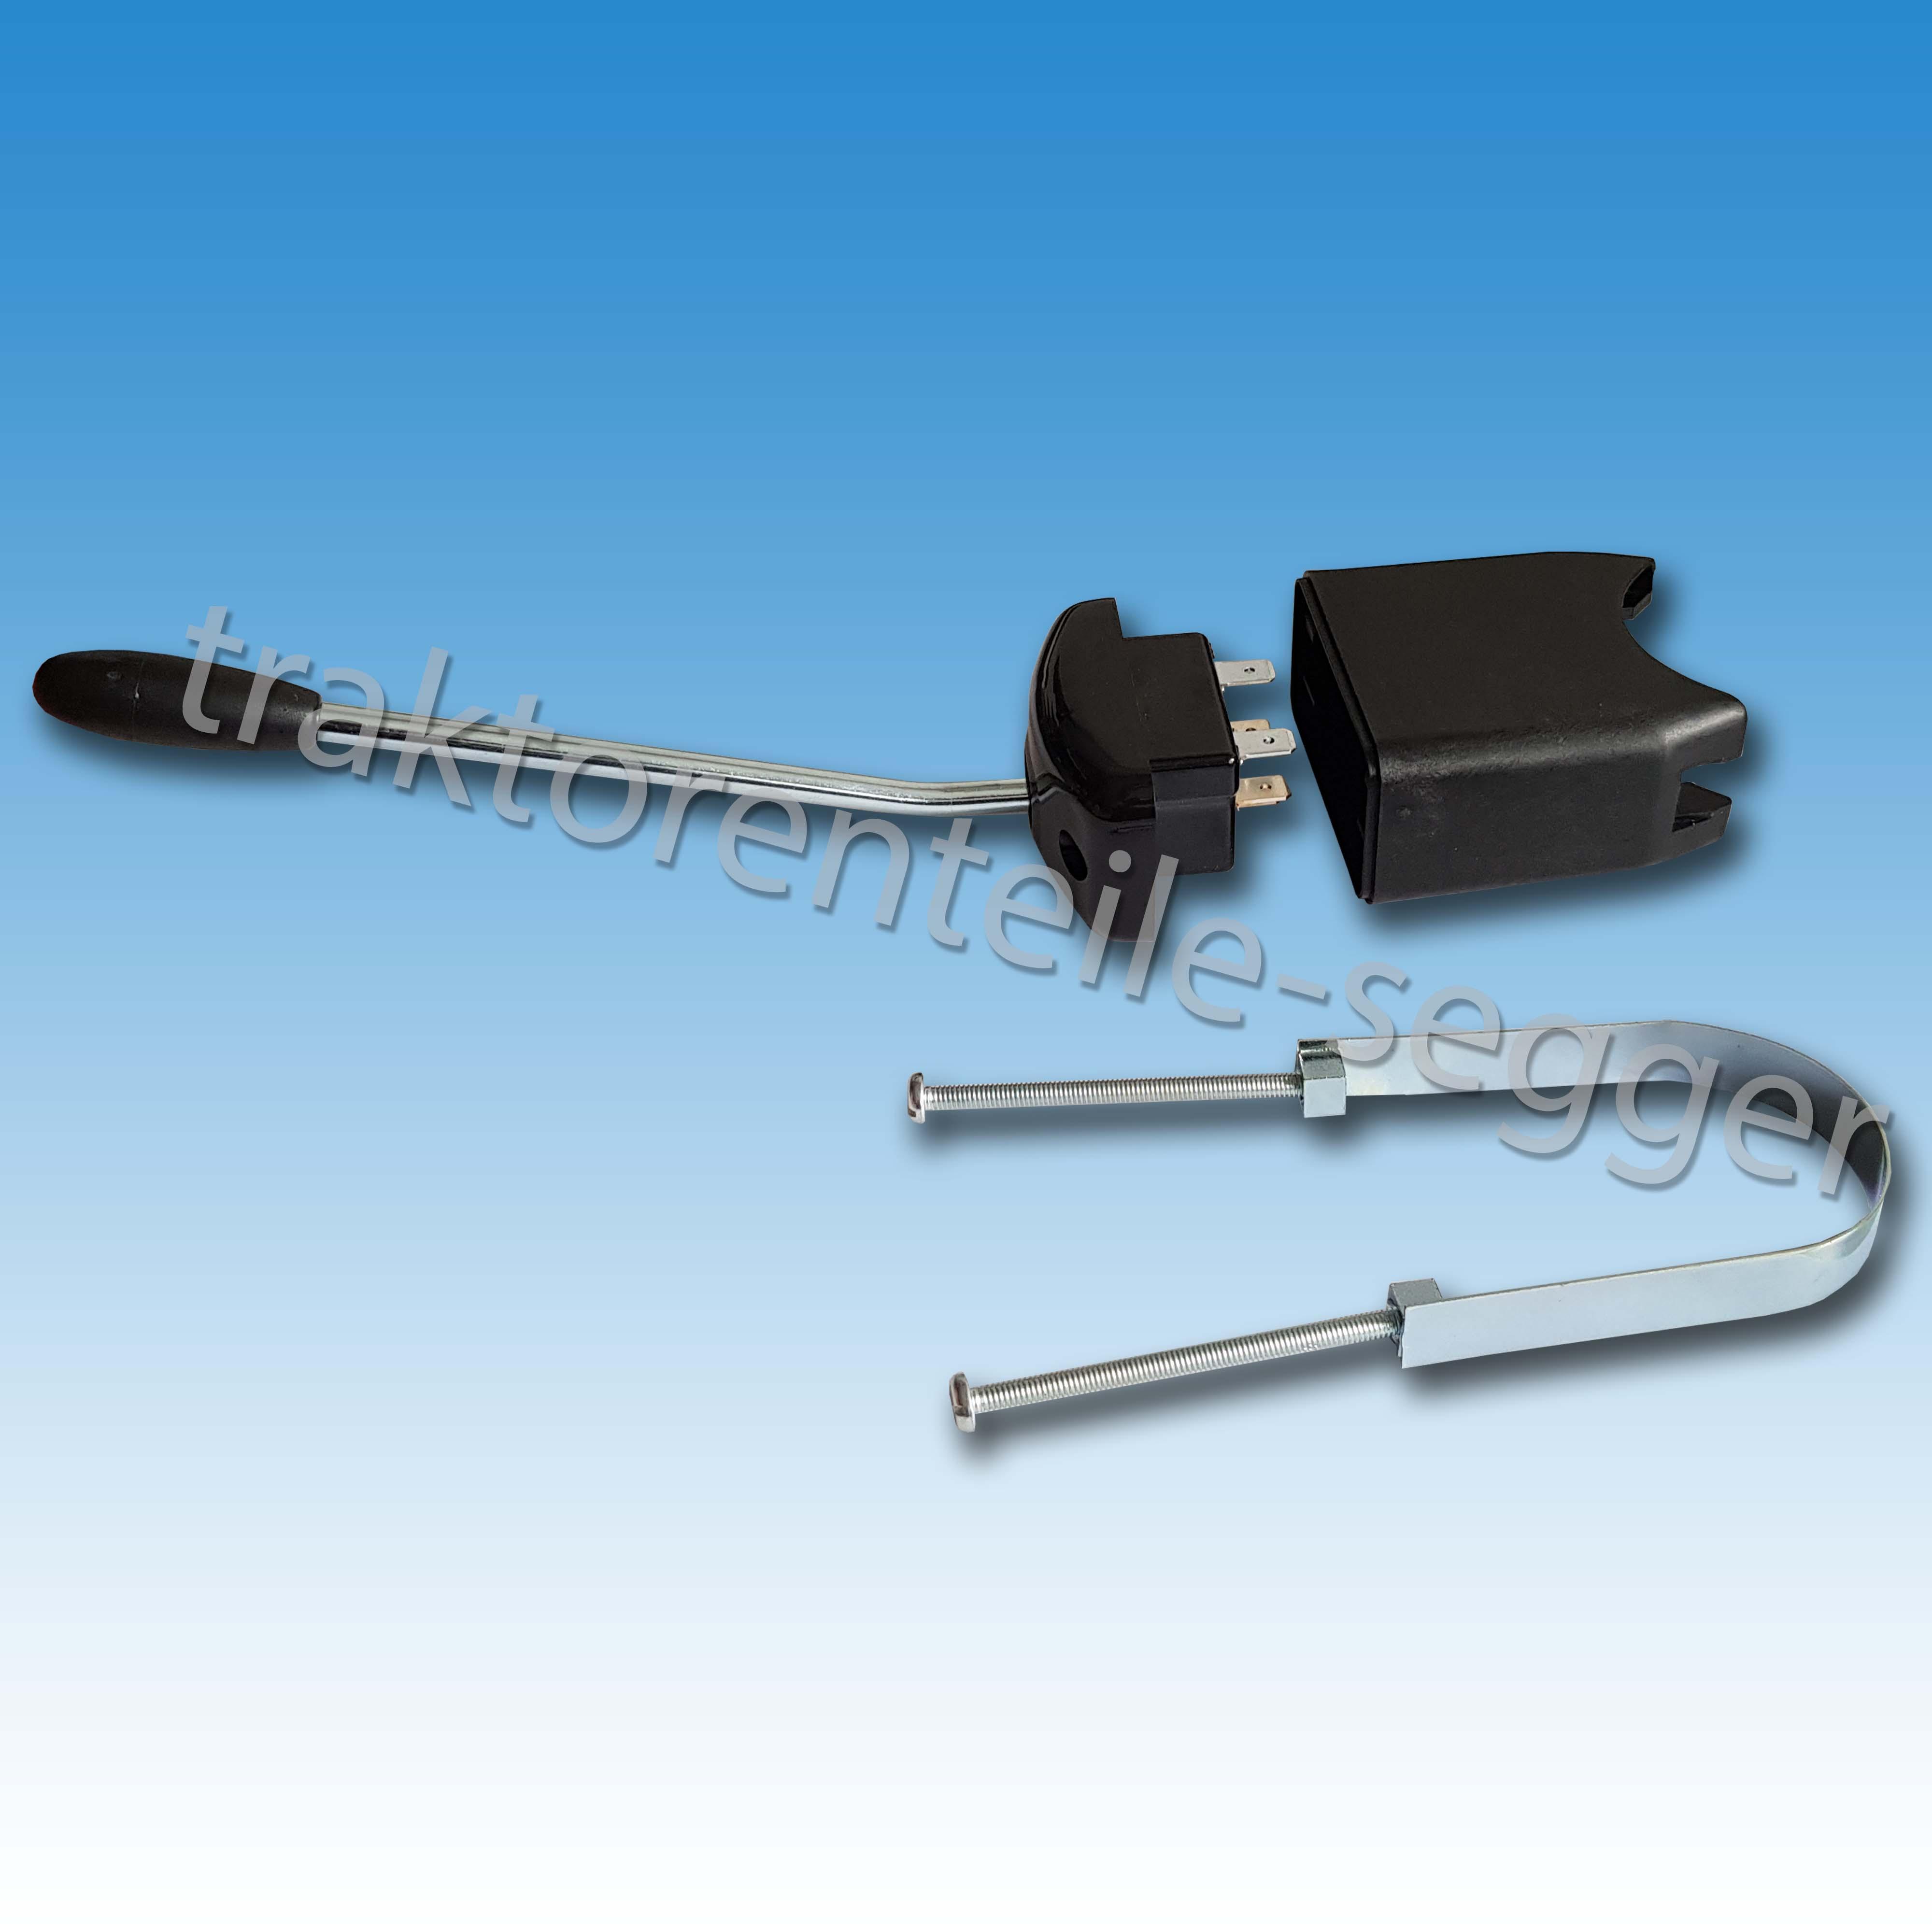 Warnblinkschalter para holder C 30 C 40 C 50 C 60 C 65 C 400 C 500